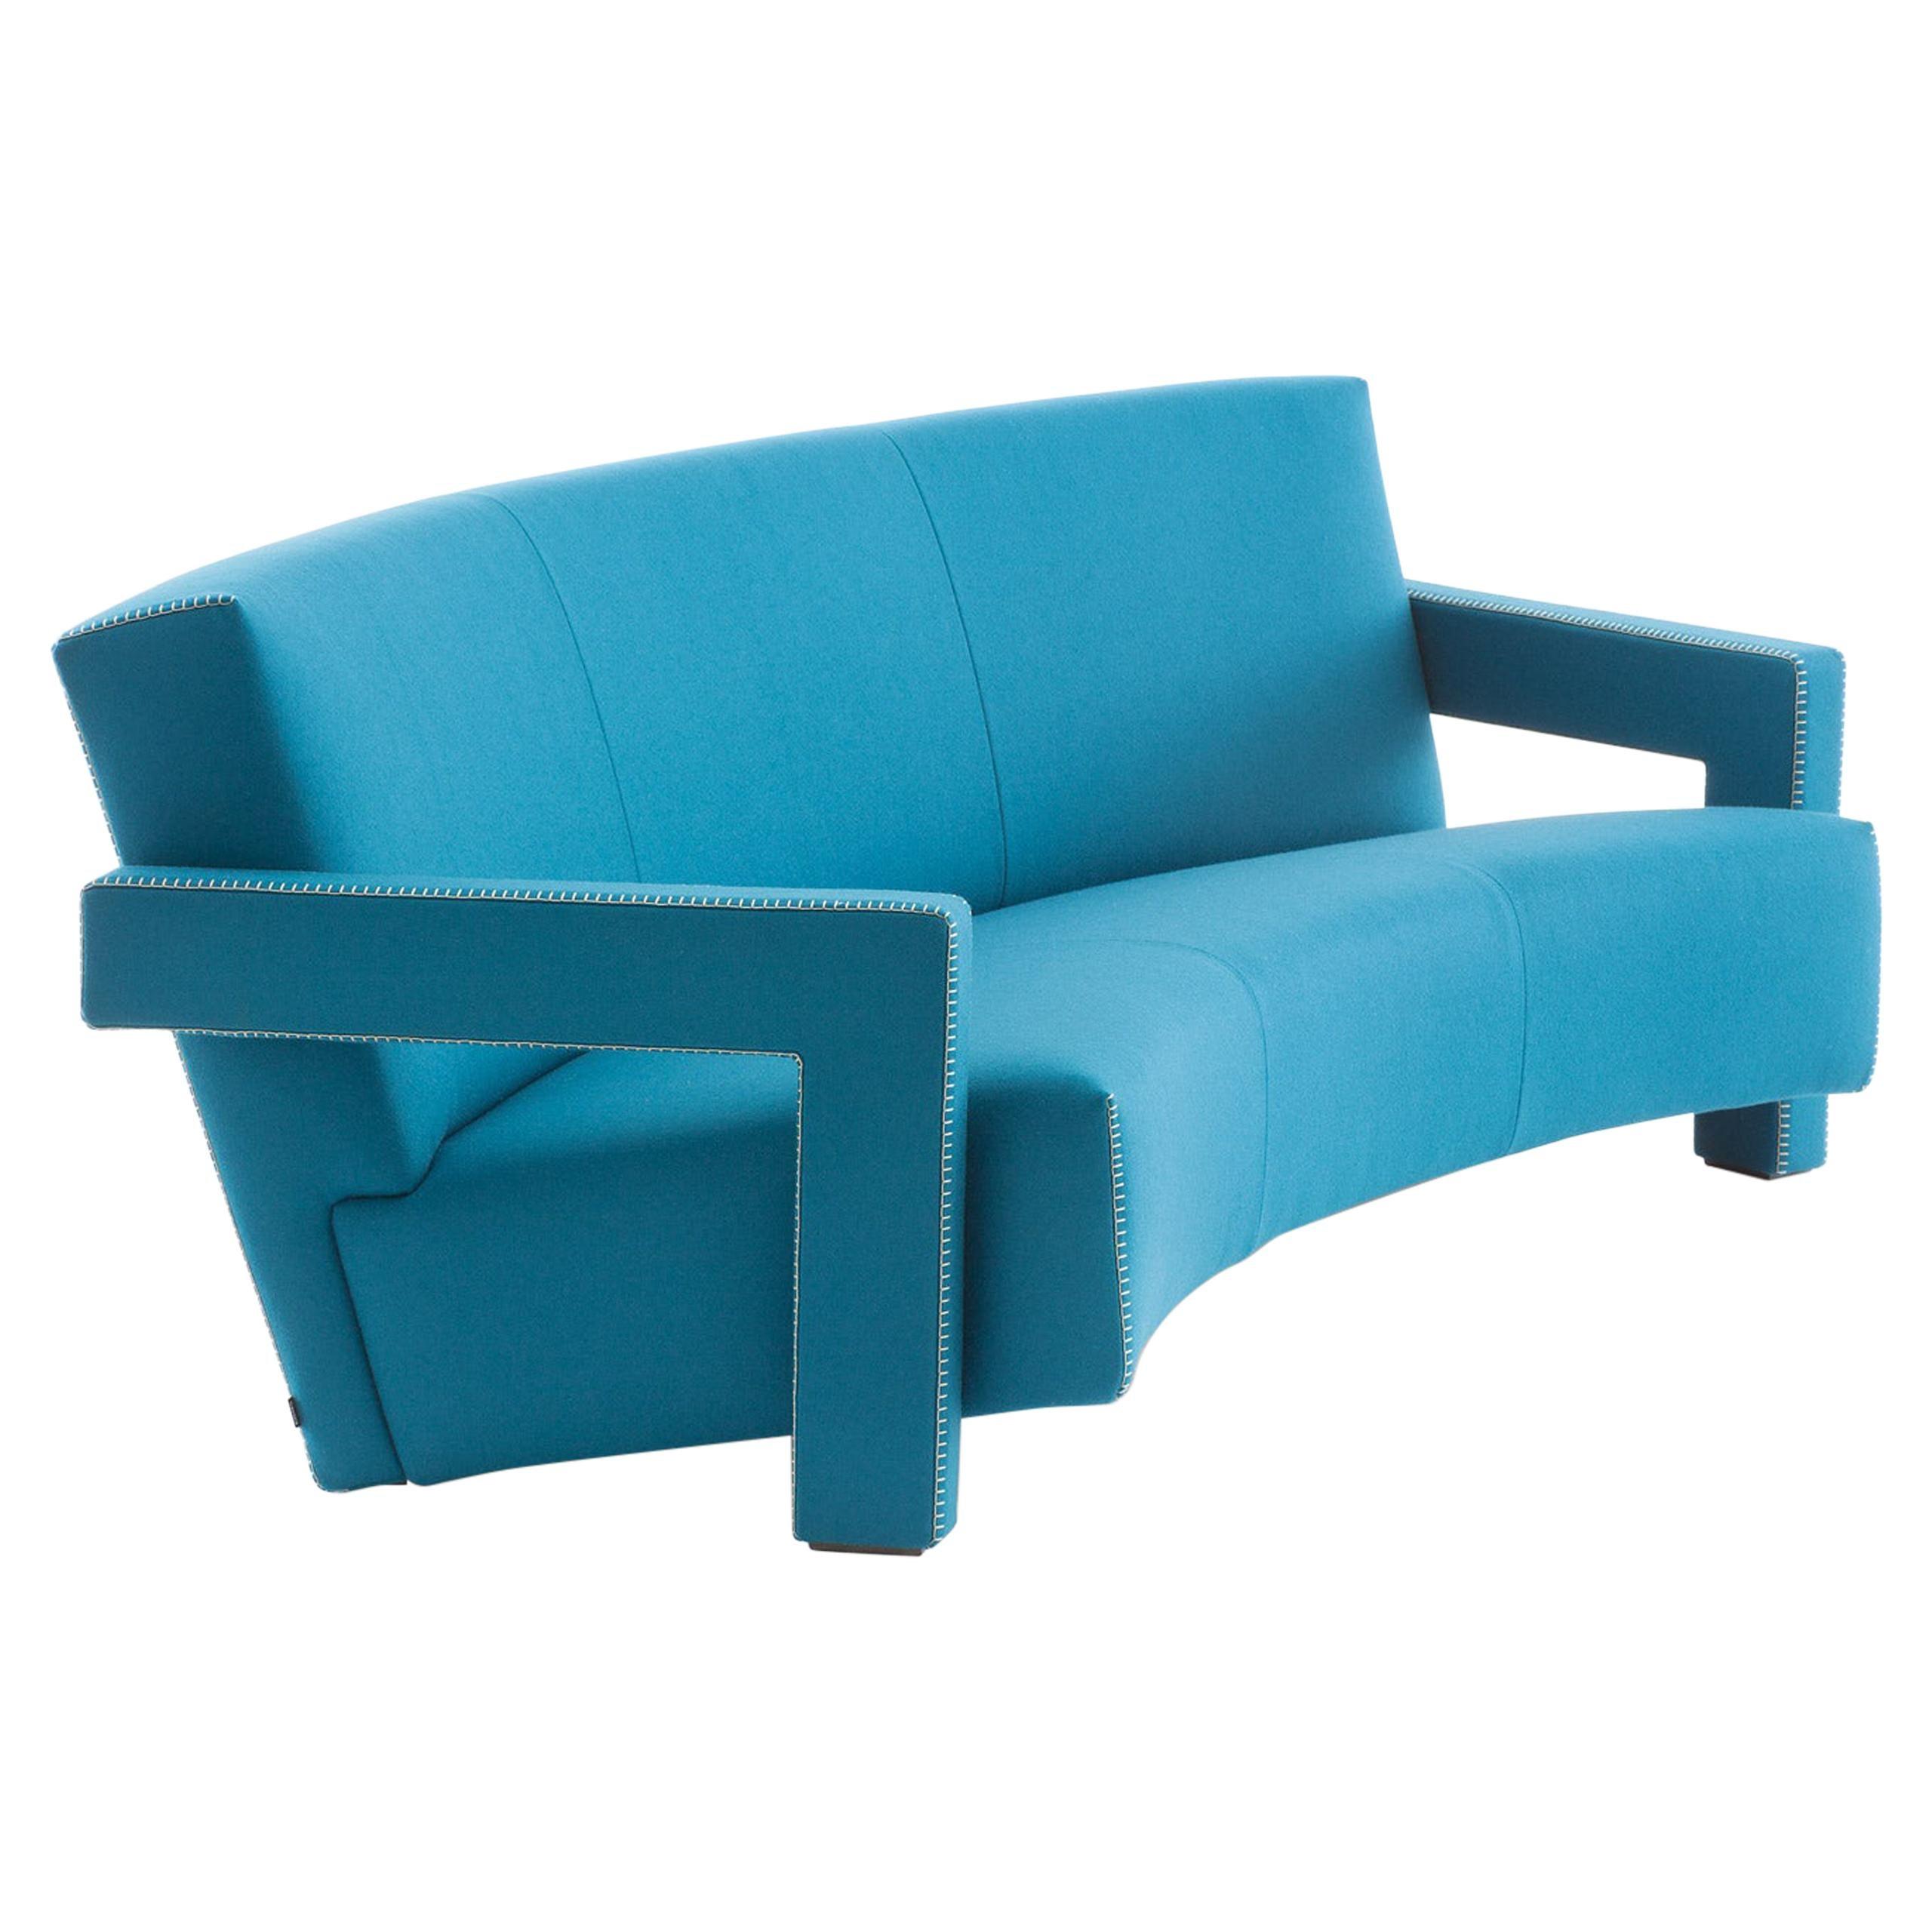 Gerrit Thomas Rietveld Utrech Sofa by Cassina